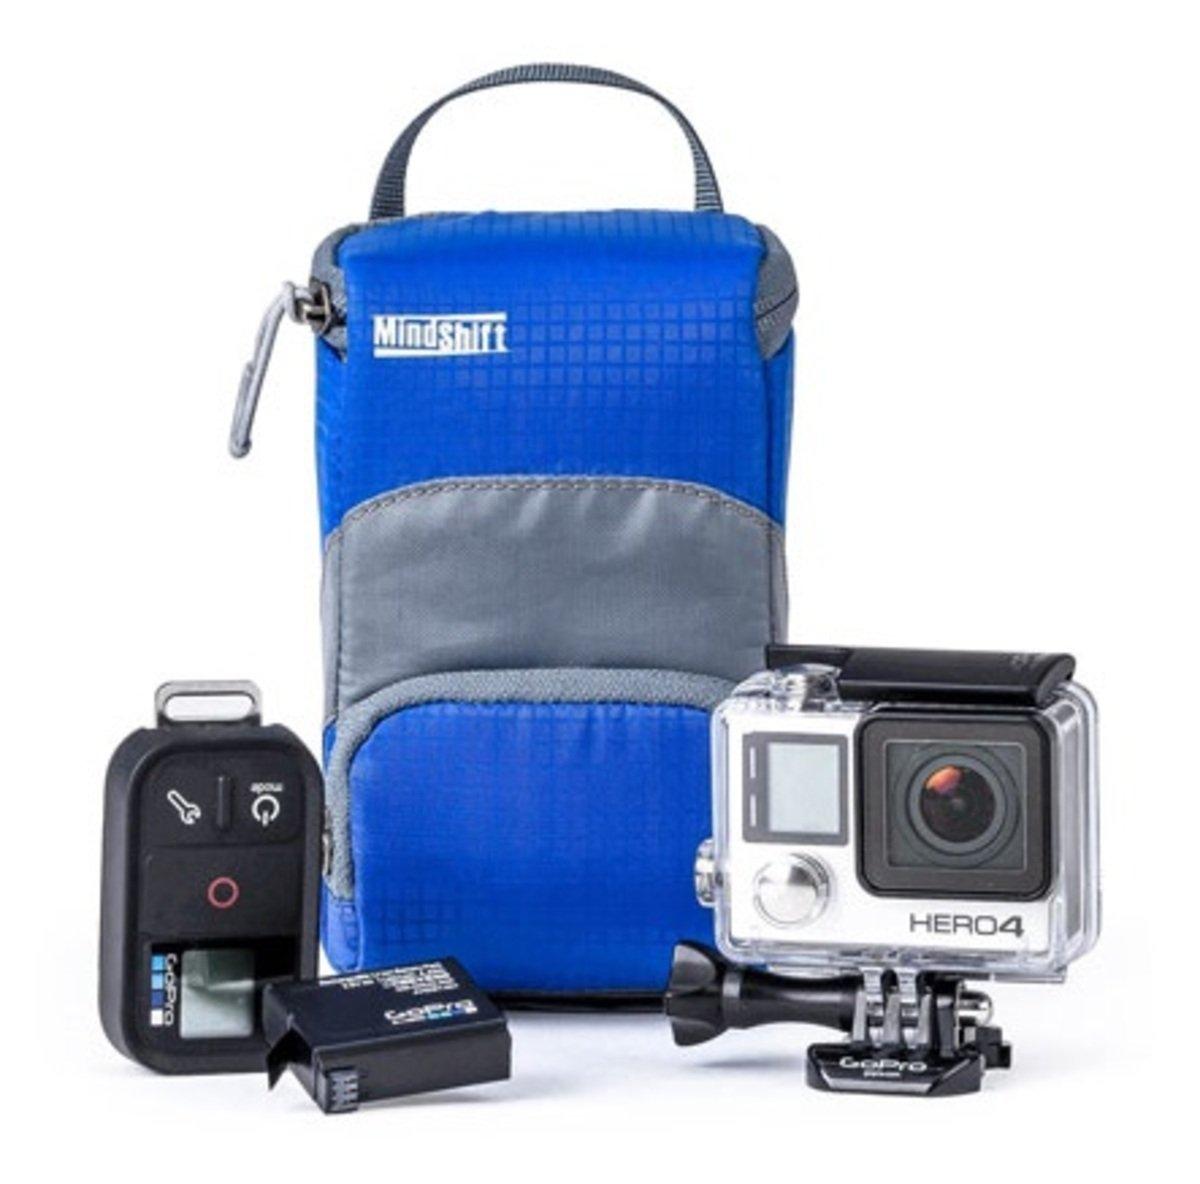 GP 1 Kit Case主機收納包-暮光藍